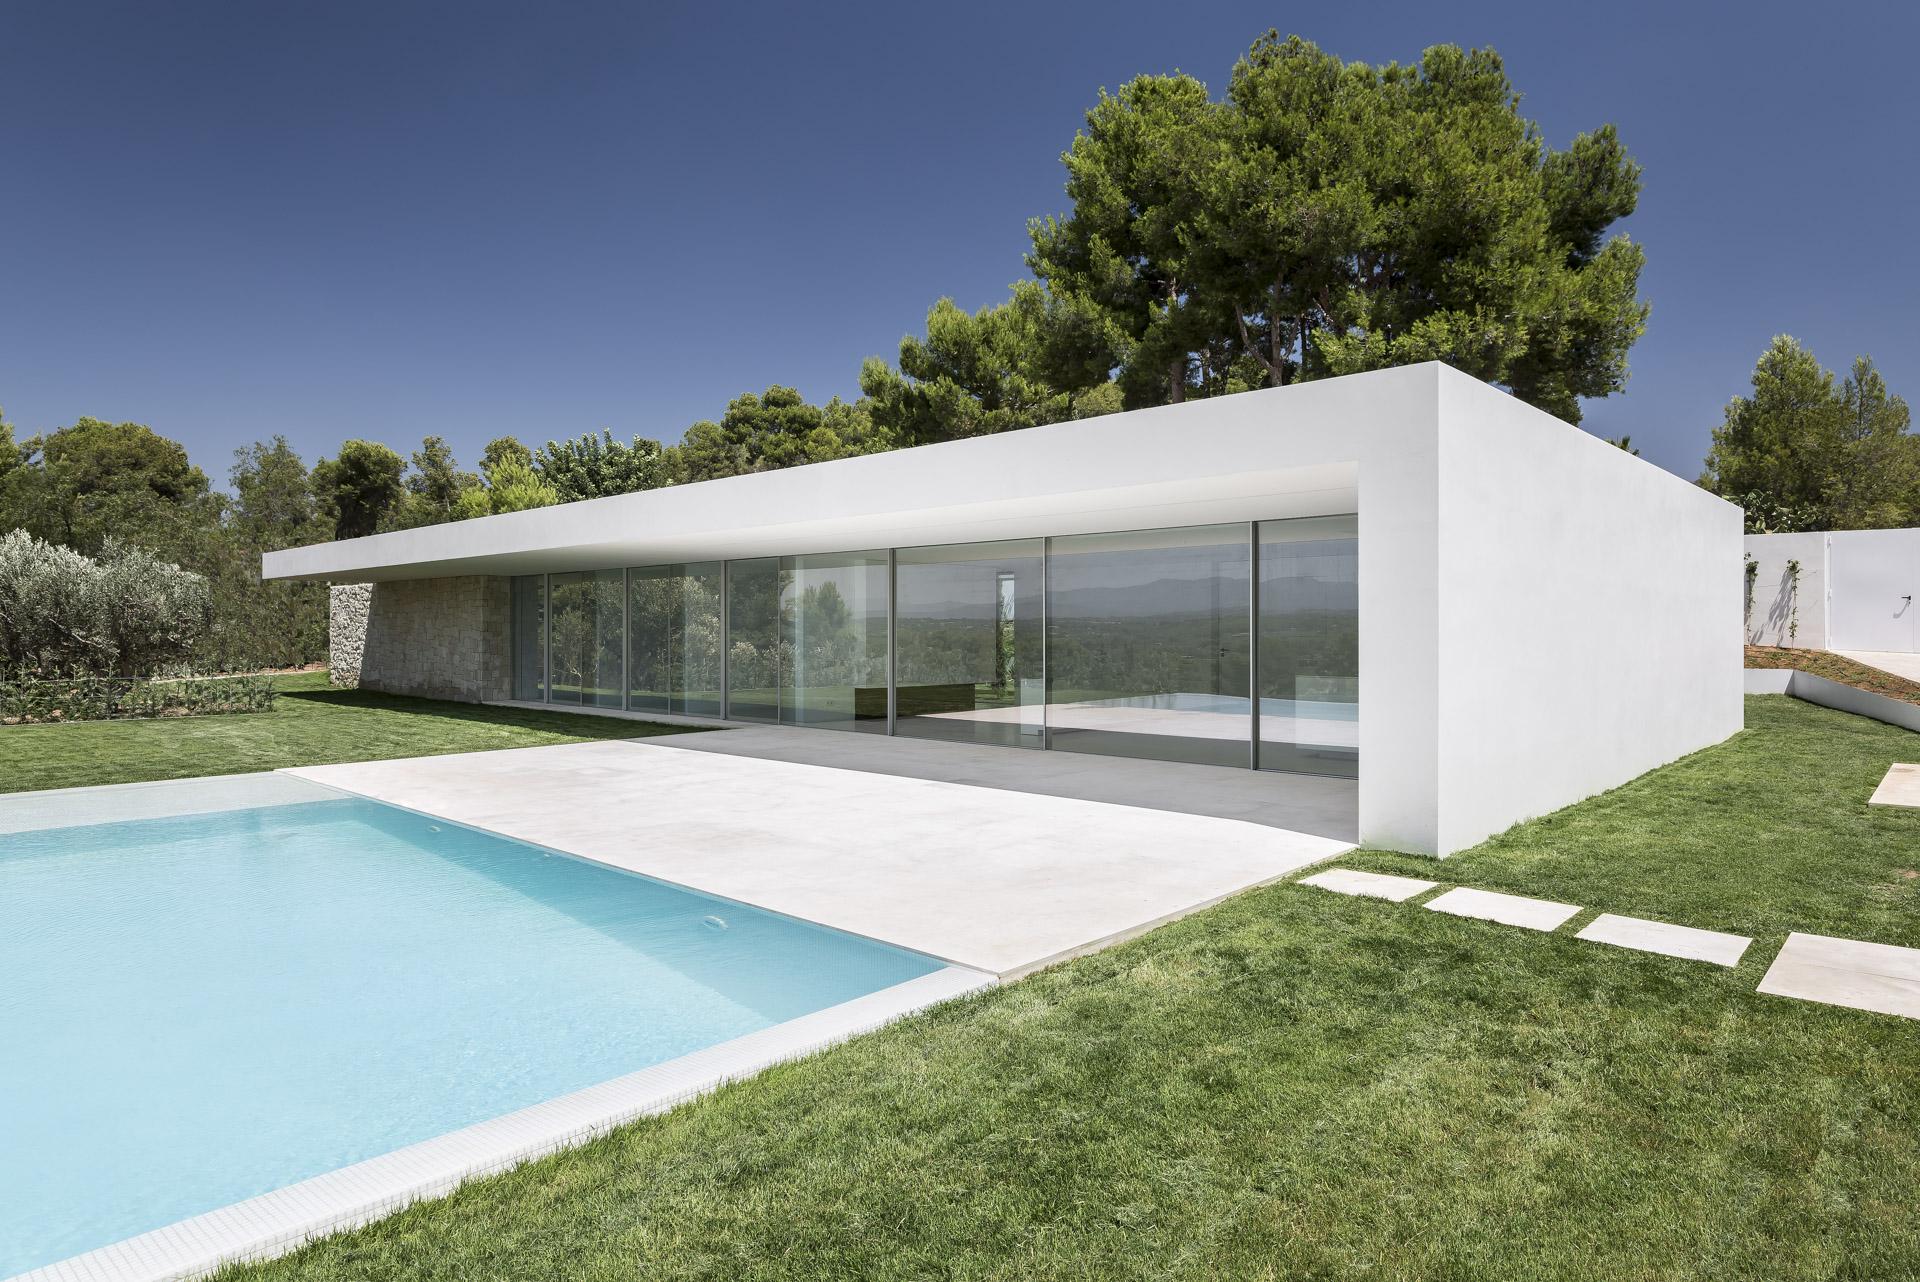 fotografia-arquitectura-valencia-german-cabo-gallardo-llopis-villamarchante-vivienda-16